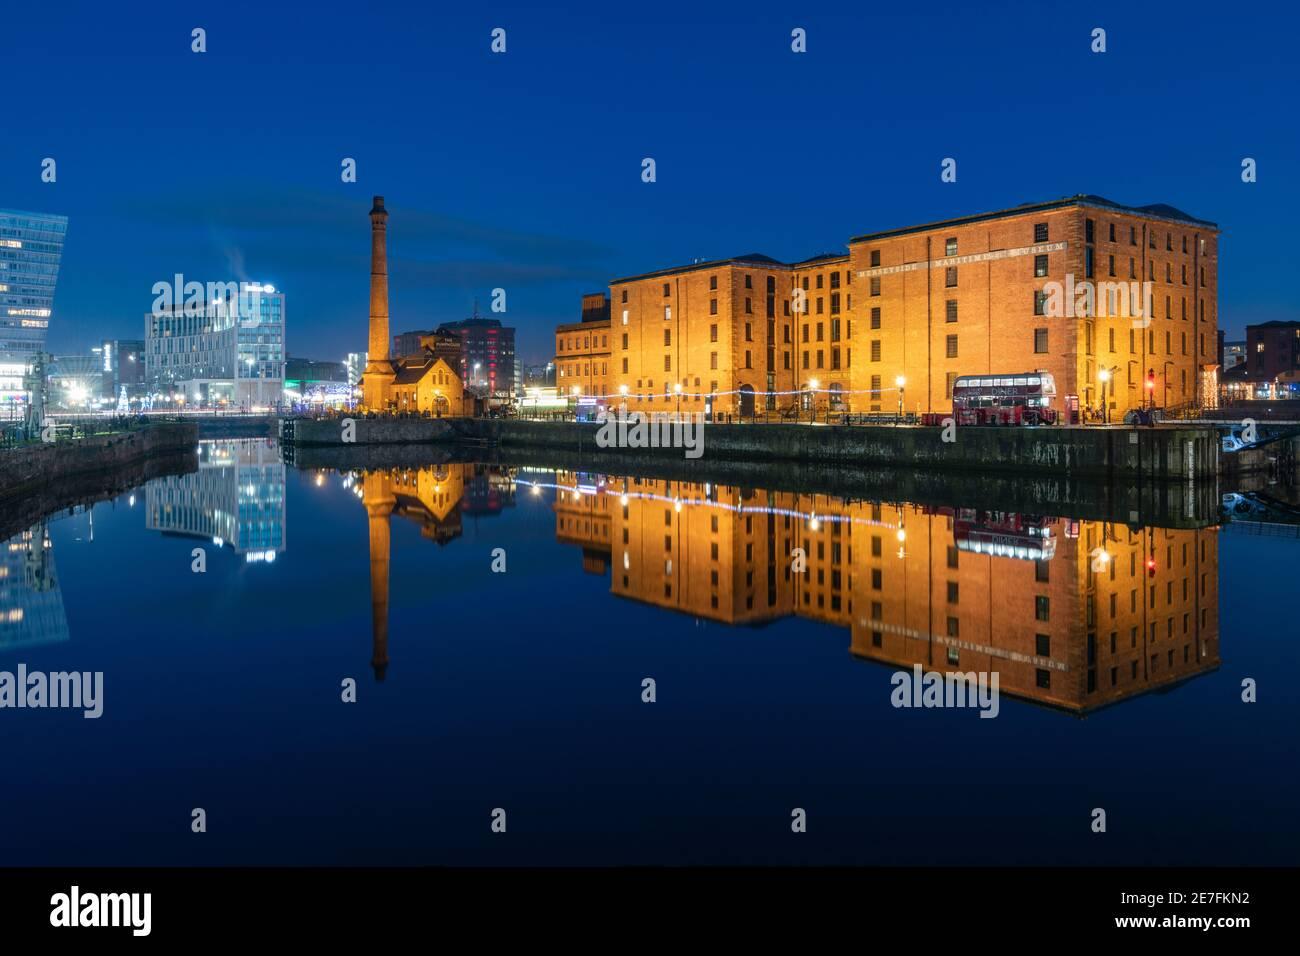 The Merseyside Maritime Museum reflected at night, Liverpool, Merseyside Stock Photo